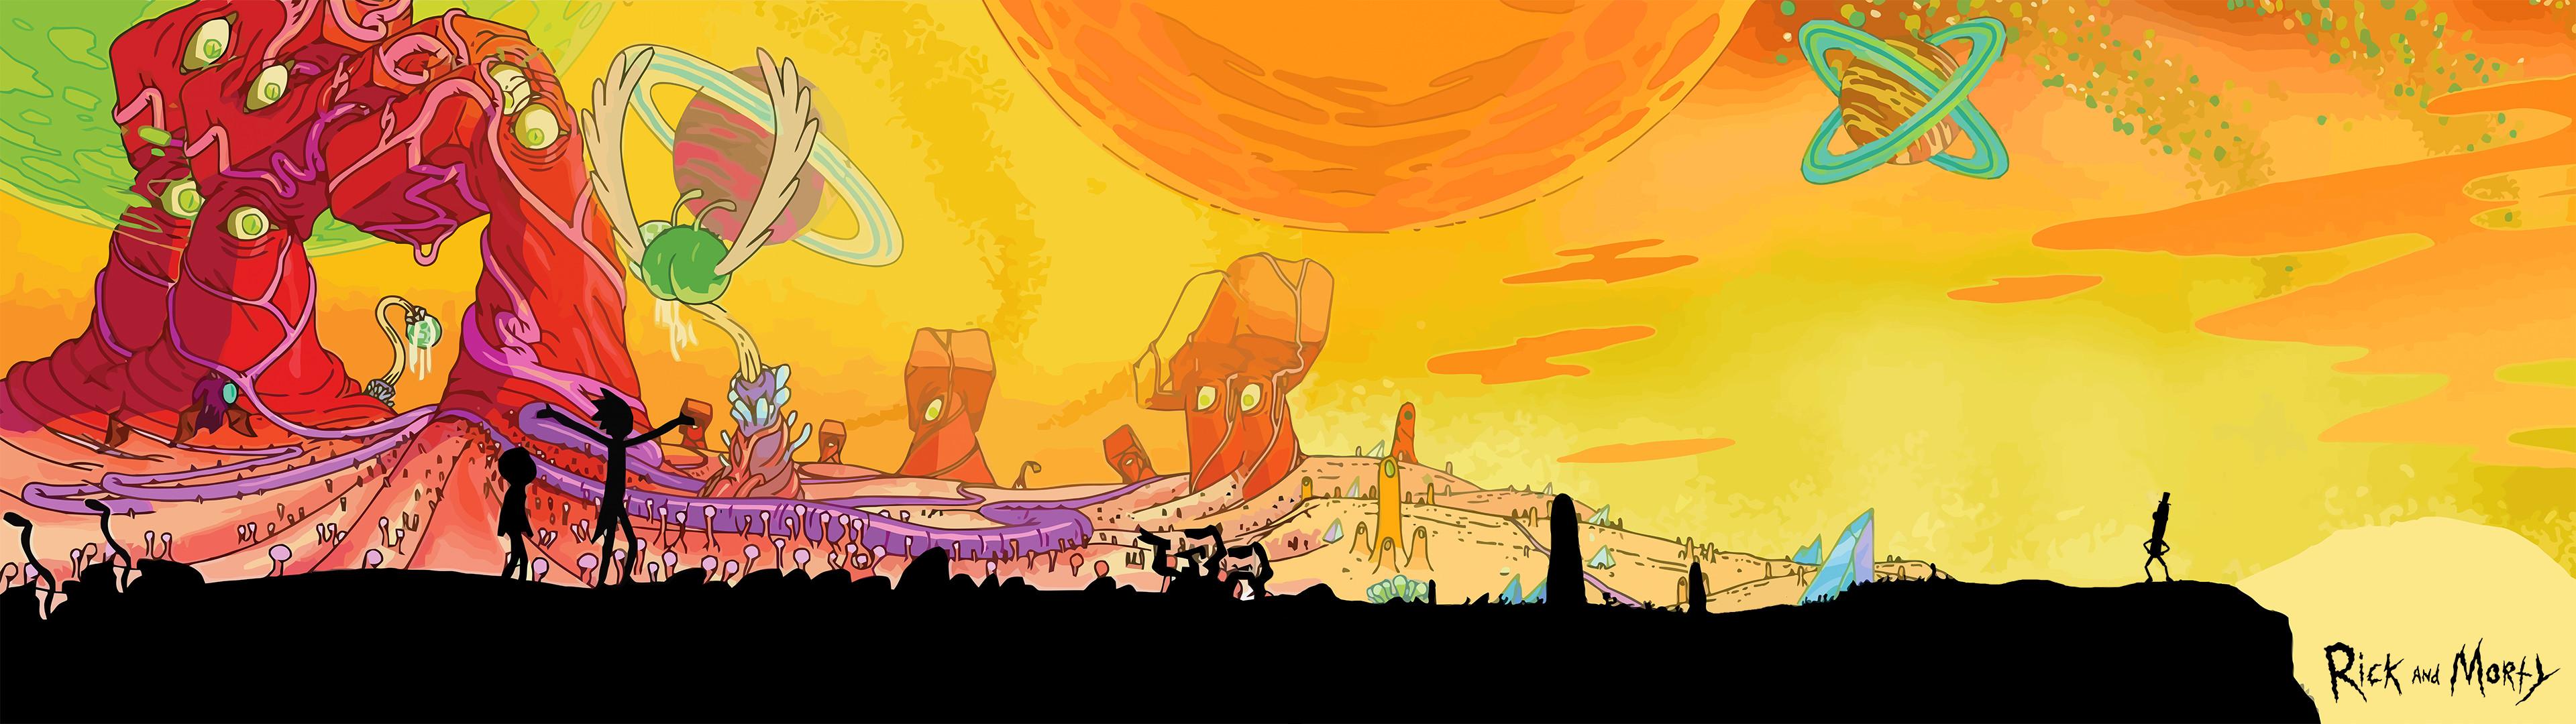 [3840×1080]Rick and Morty Dual Screen wallpaper